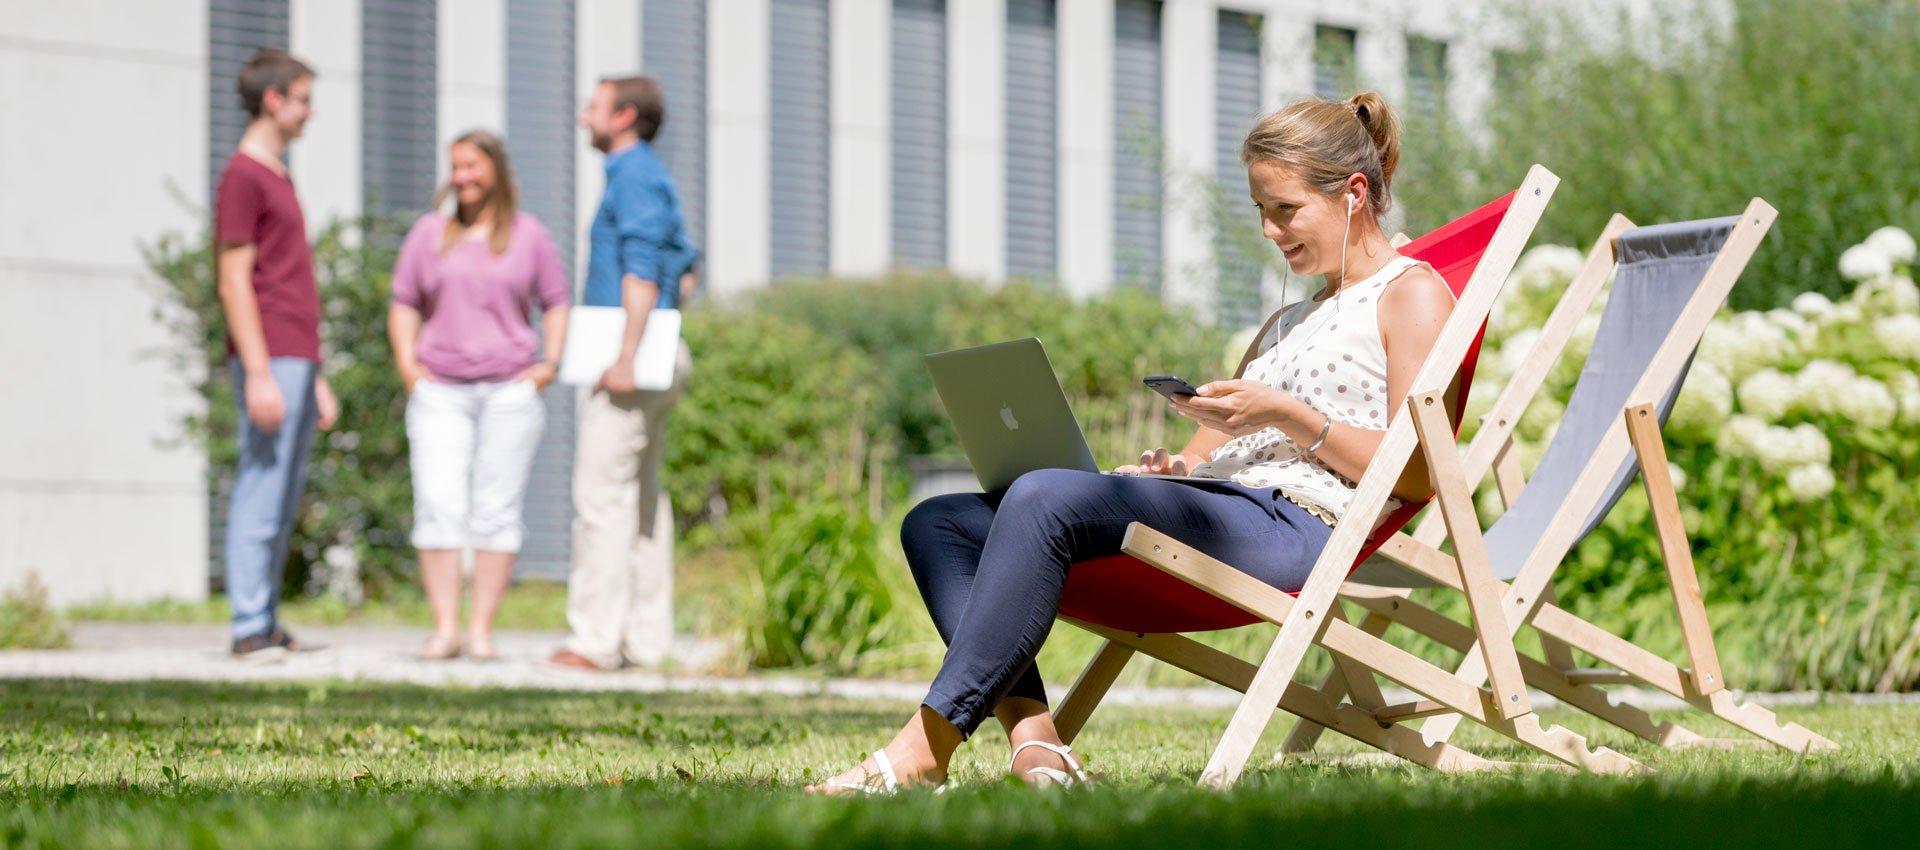 Coworking im Grünen publish-industry